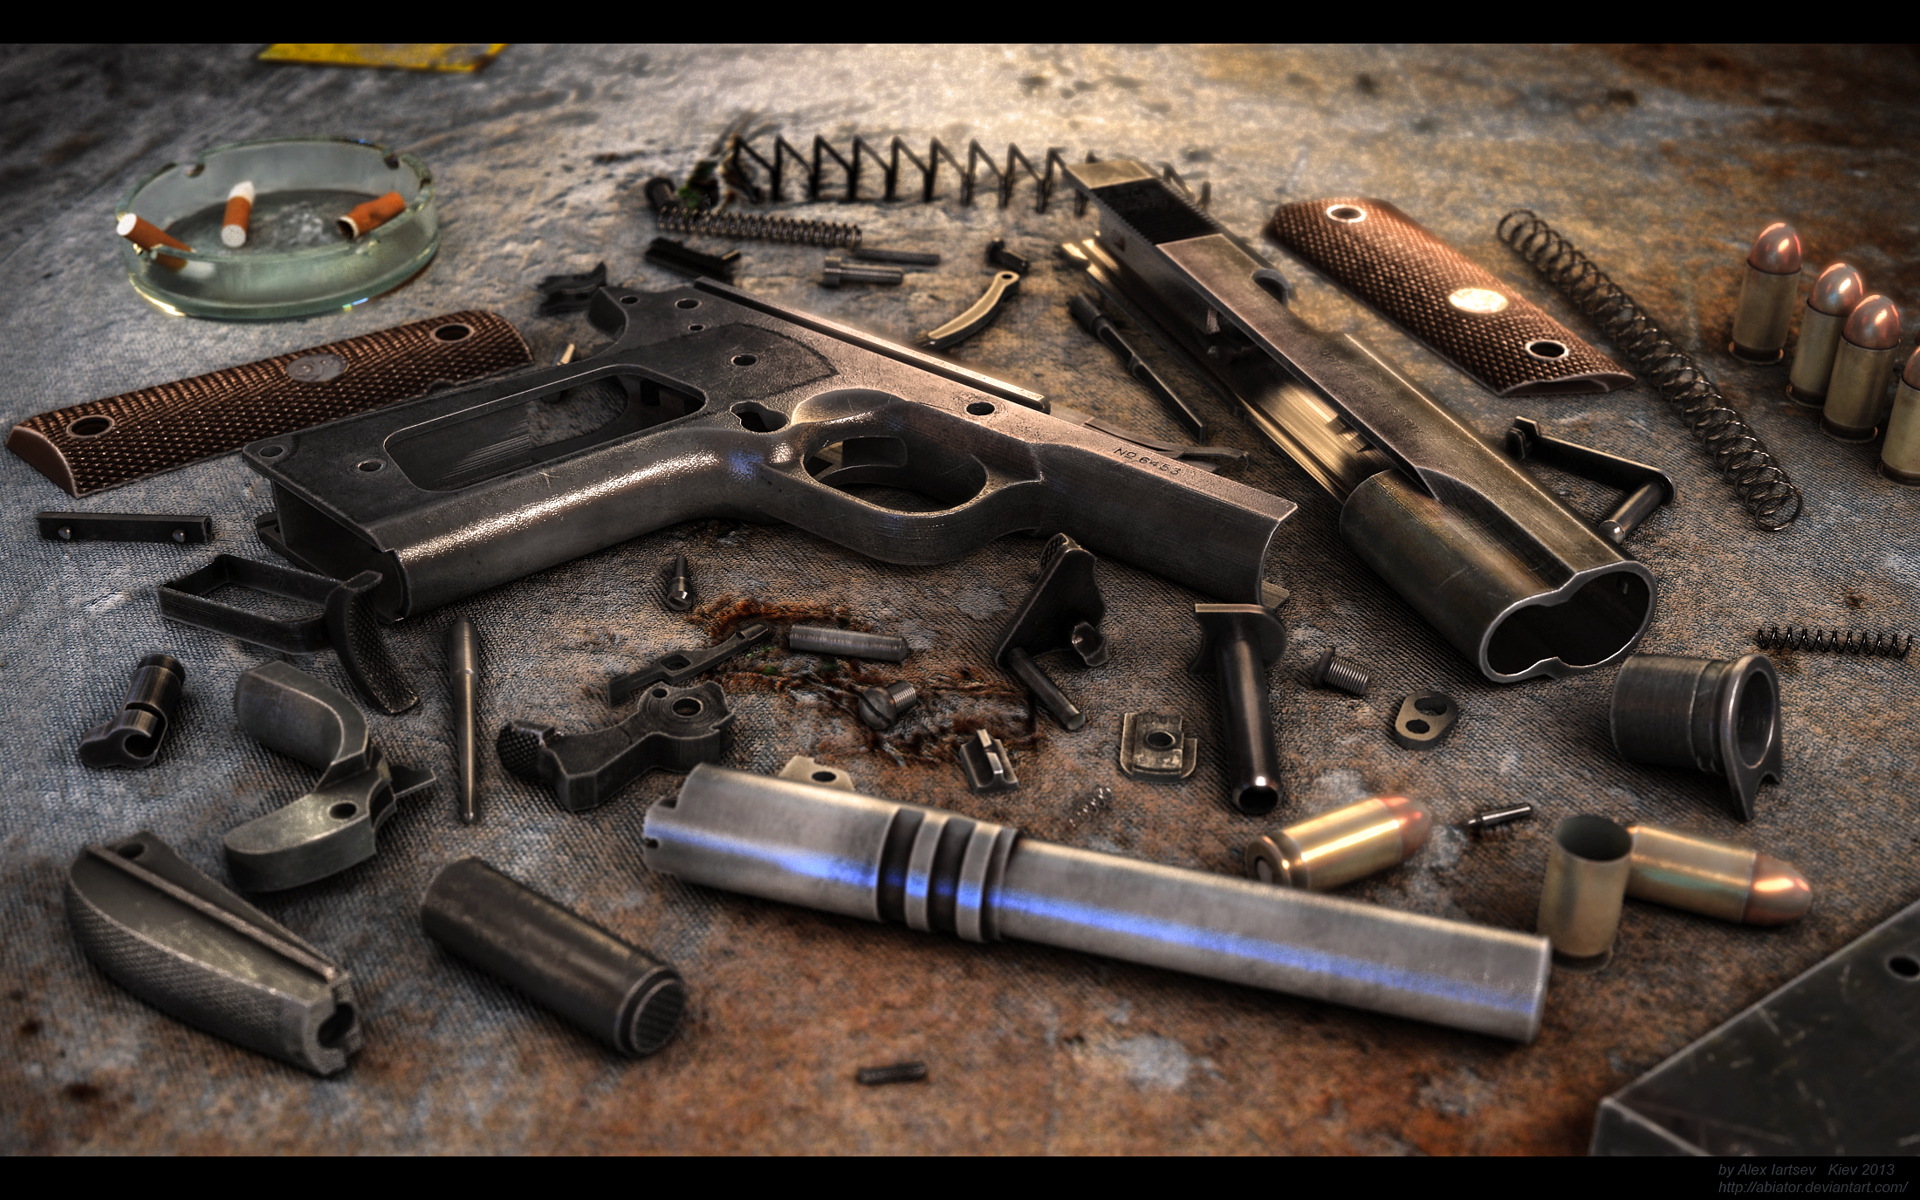 Colt 1911 by ABiator 1920x1200